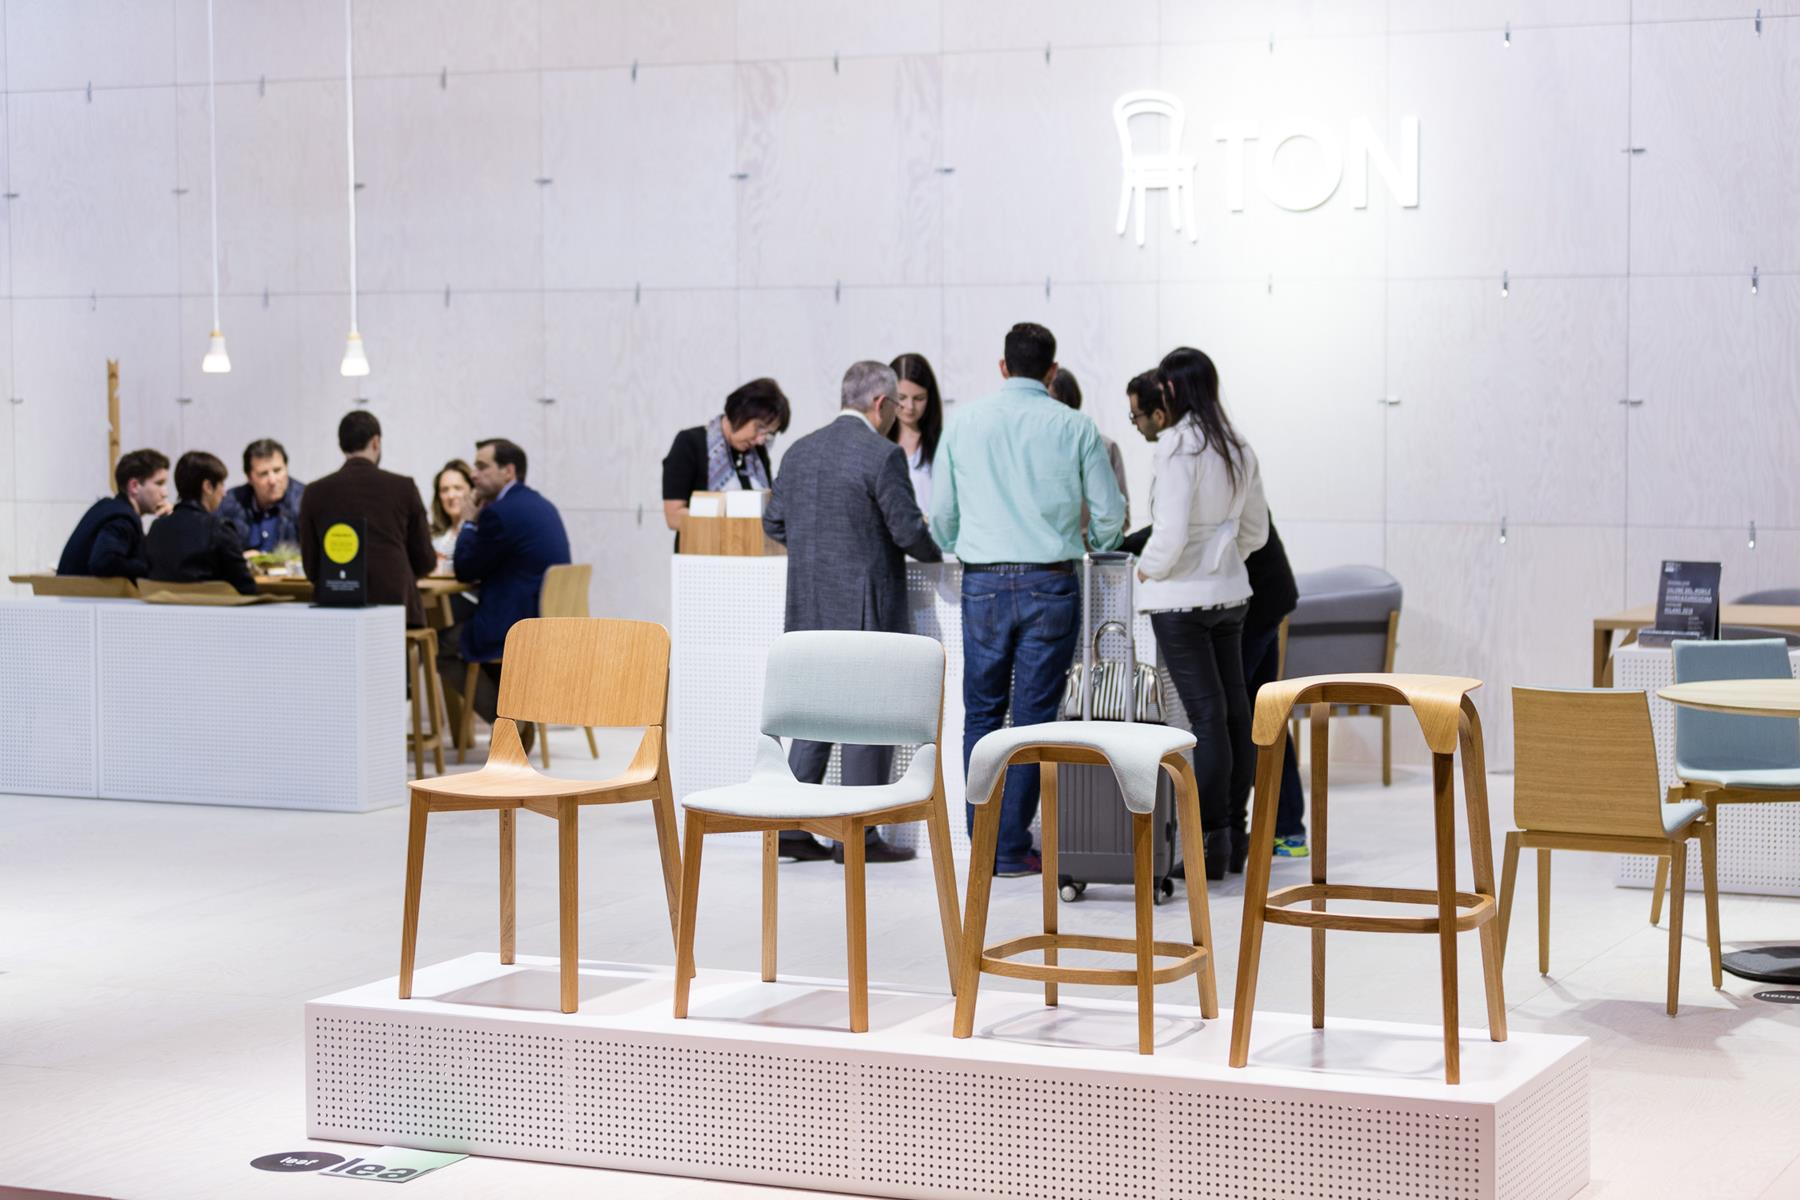 Salone del mobile milano 2016 ton a s idle vyroben for Salone del mobile milano 2016 date